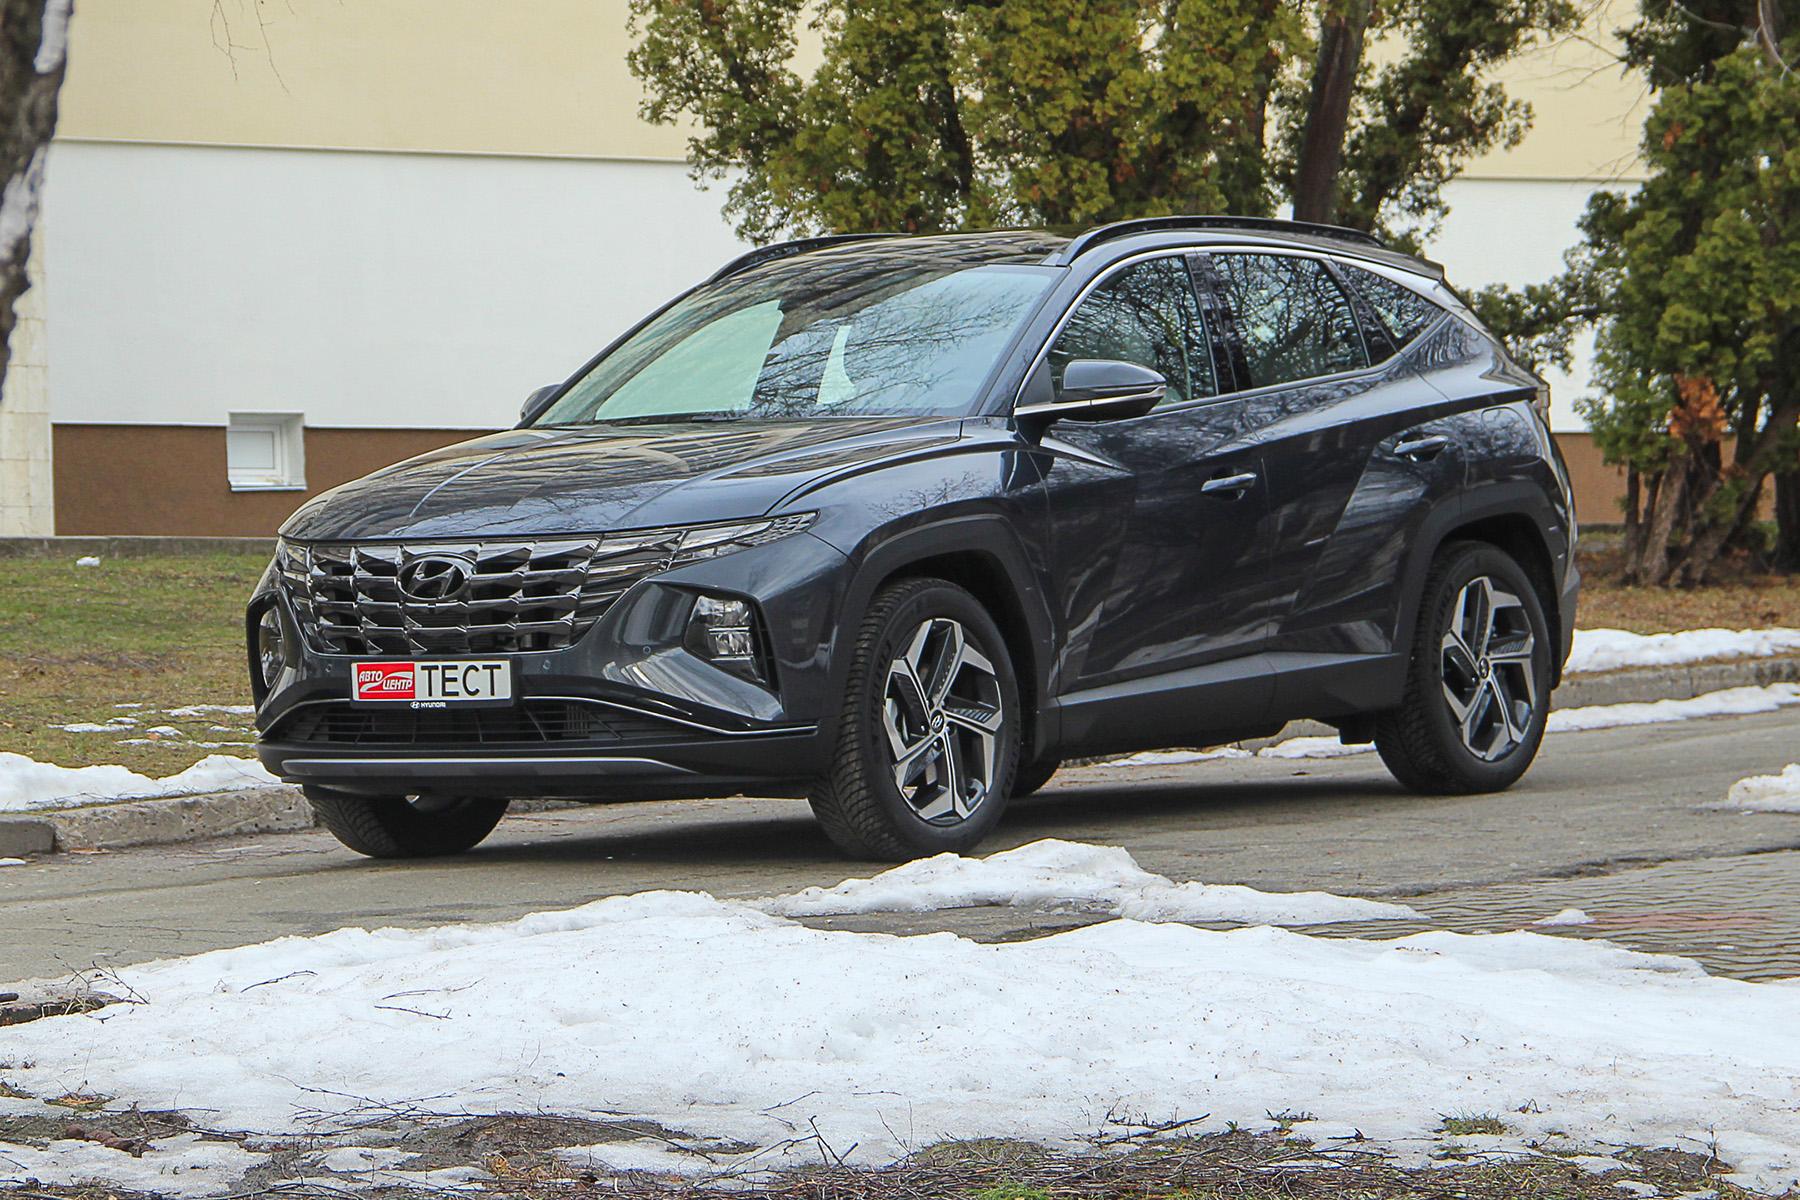 Тест-драйв Hyundai Tucson 2021 - дизайн решает все? (видео)